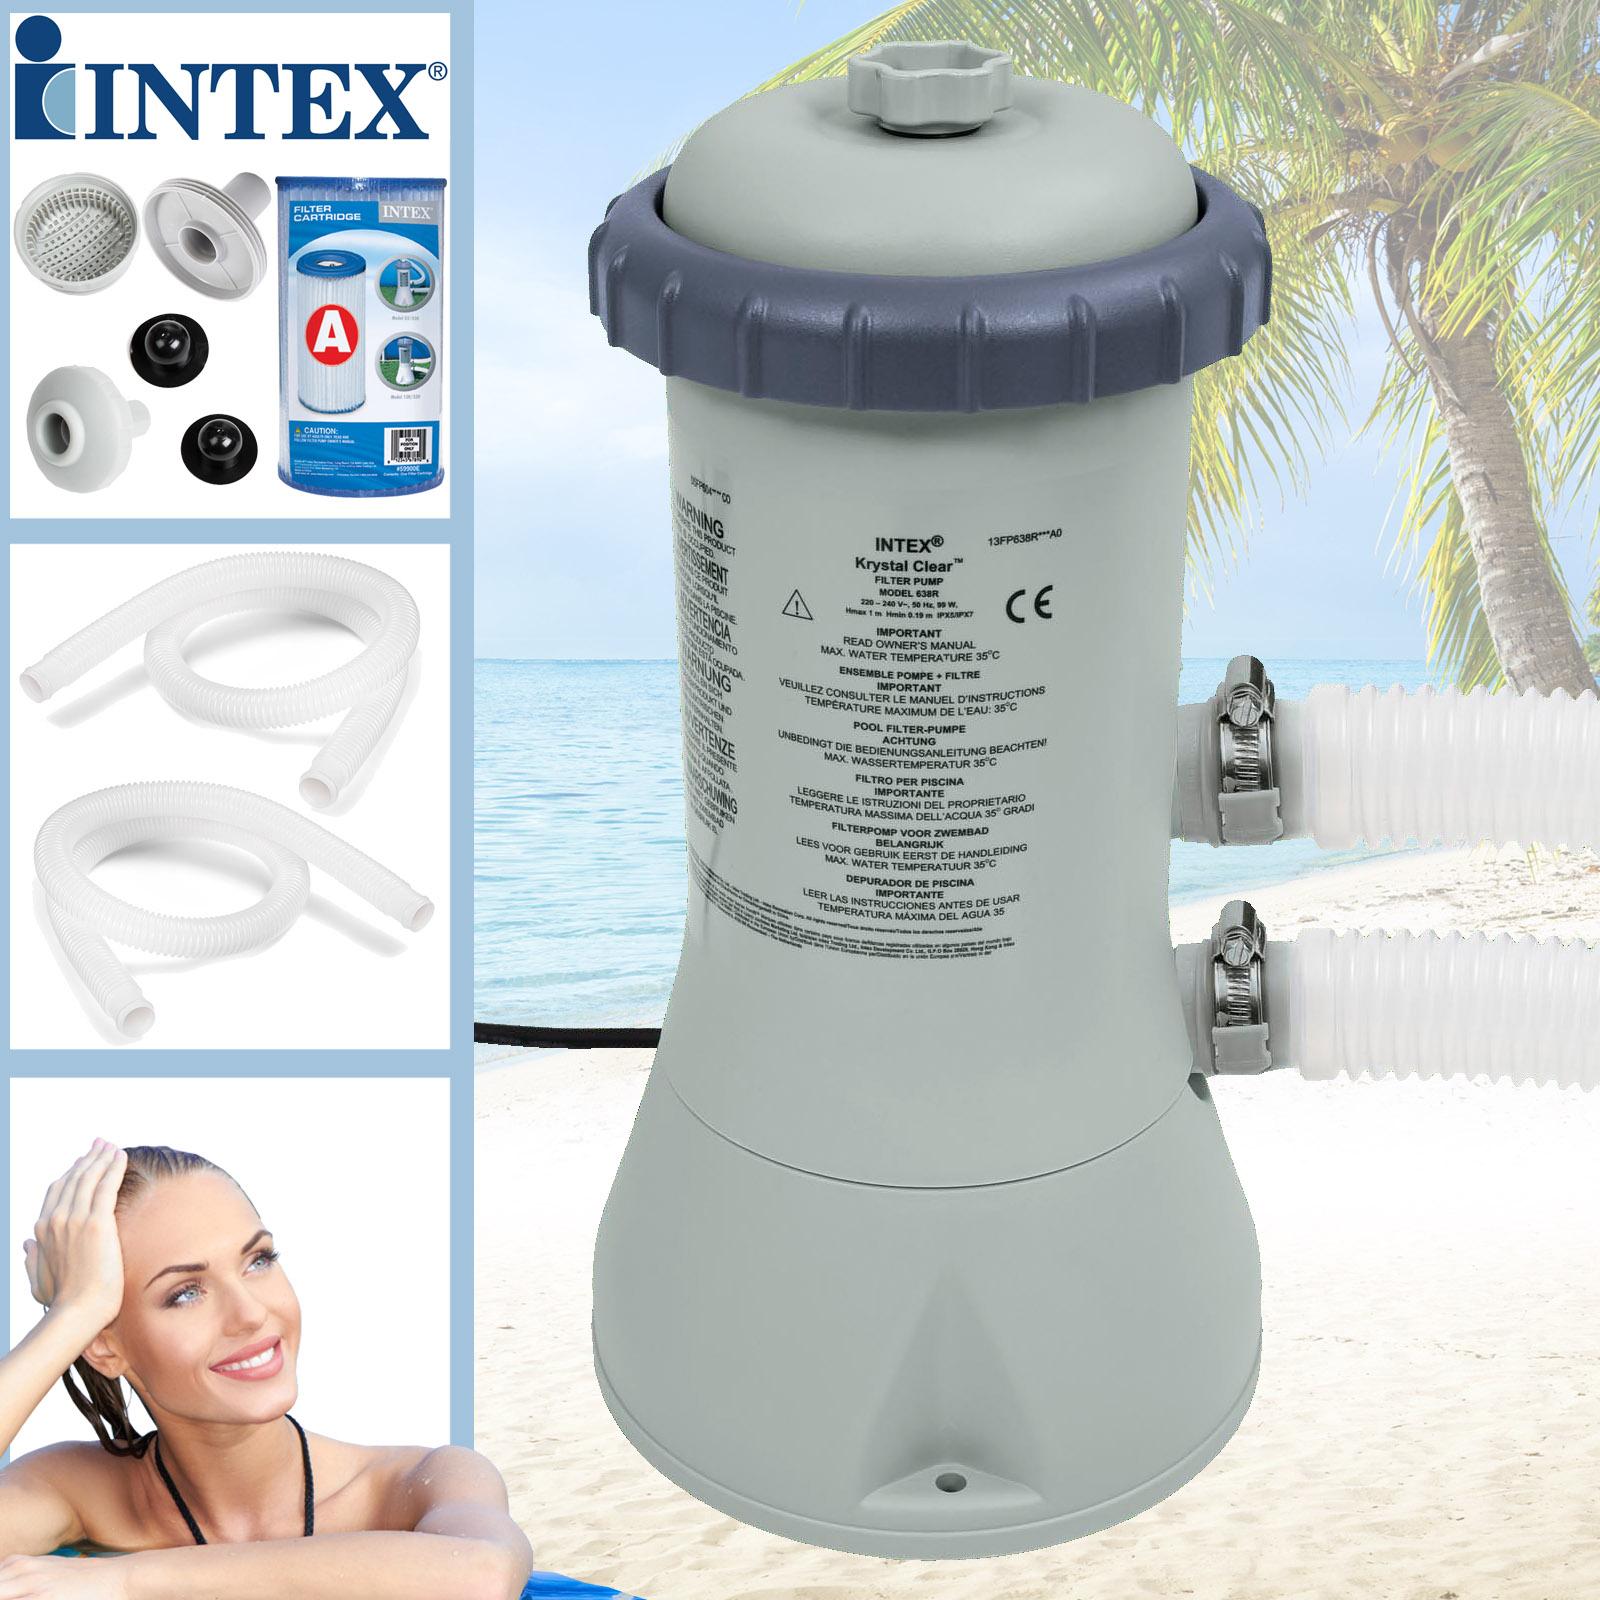 Intex 28638 Filterkartuschenpumpe - Pumpleistung 3785 Liter/Std.